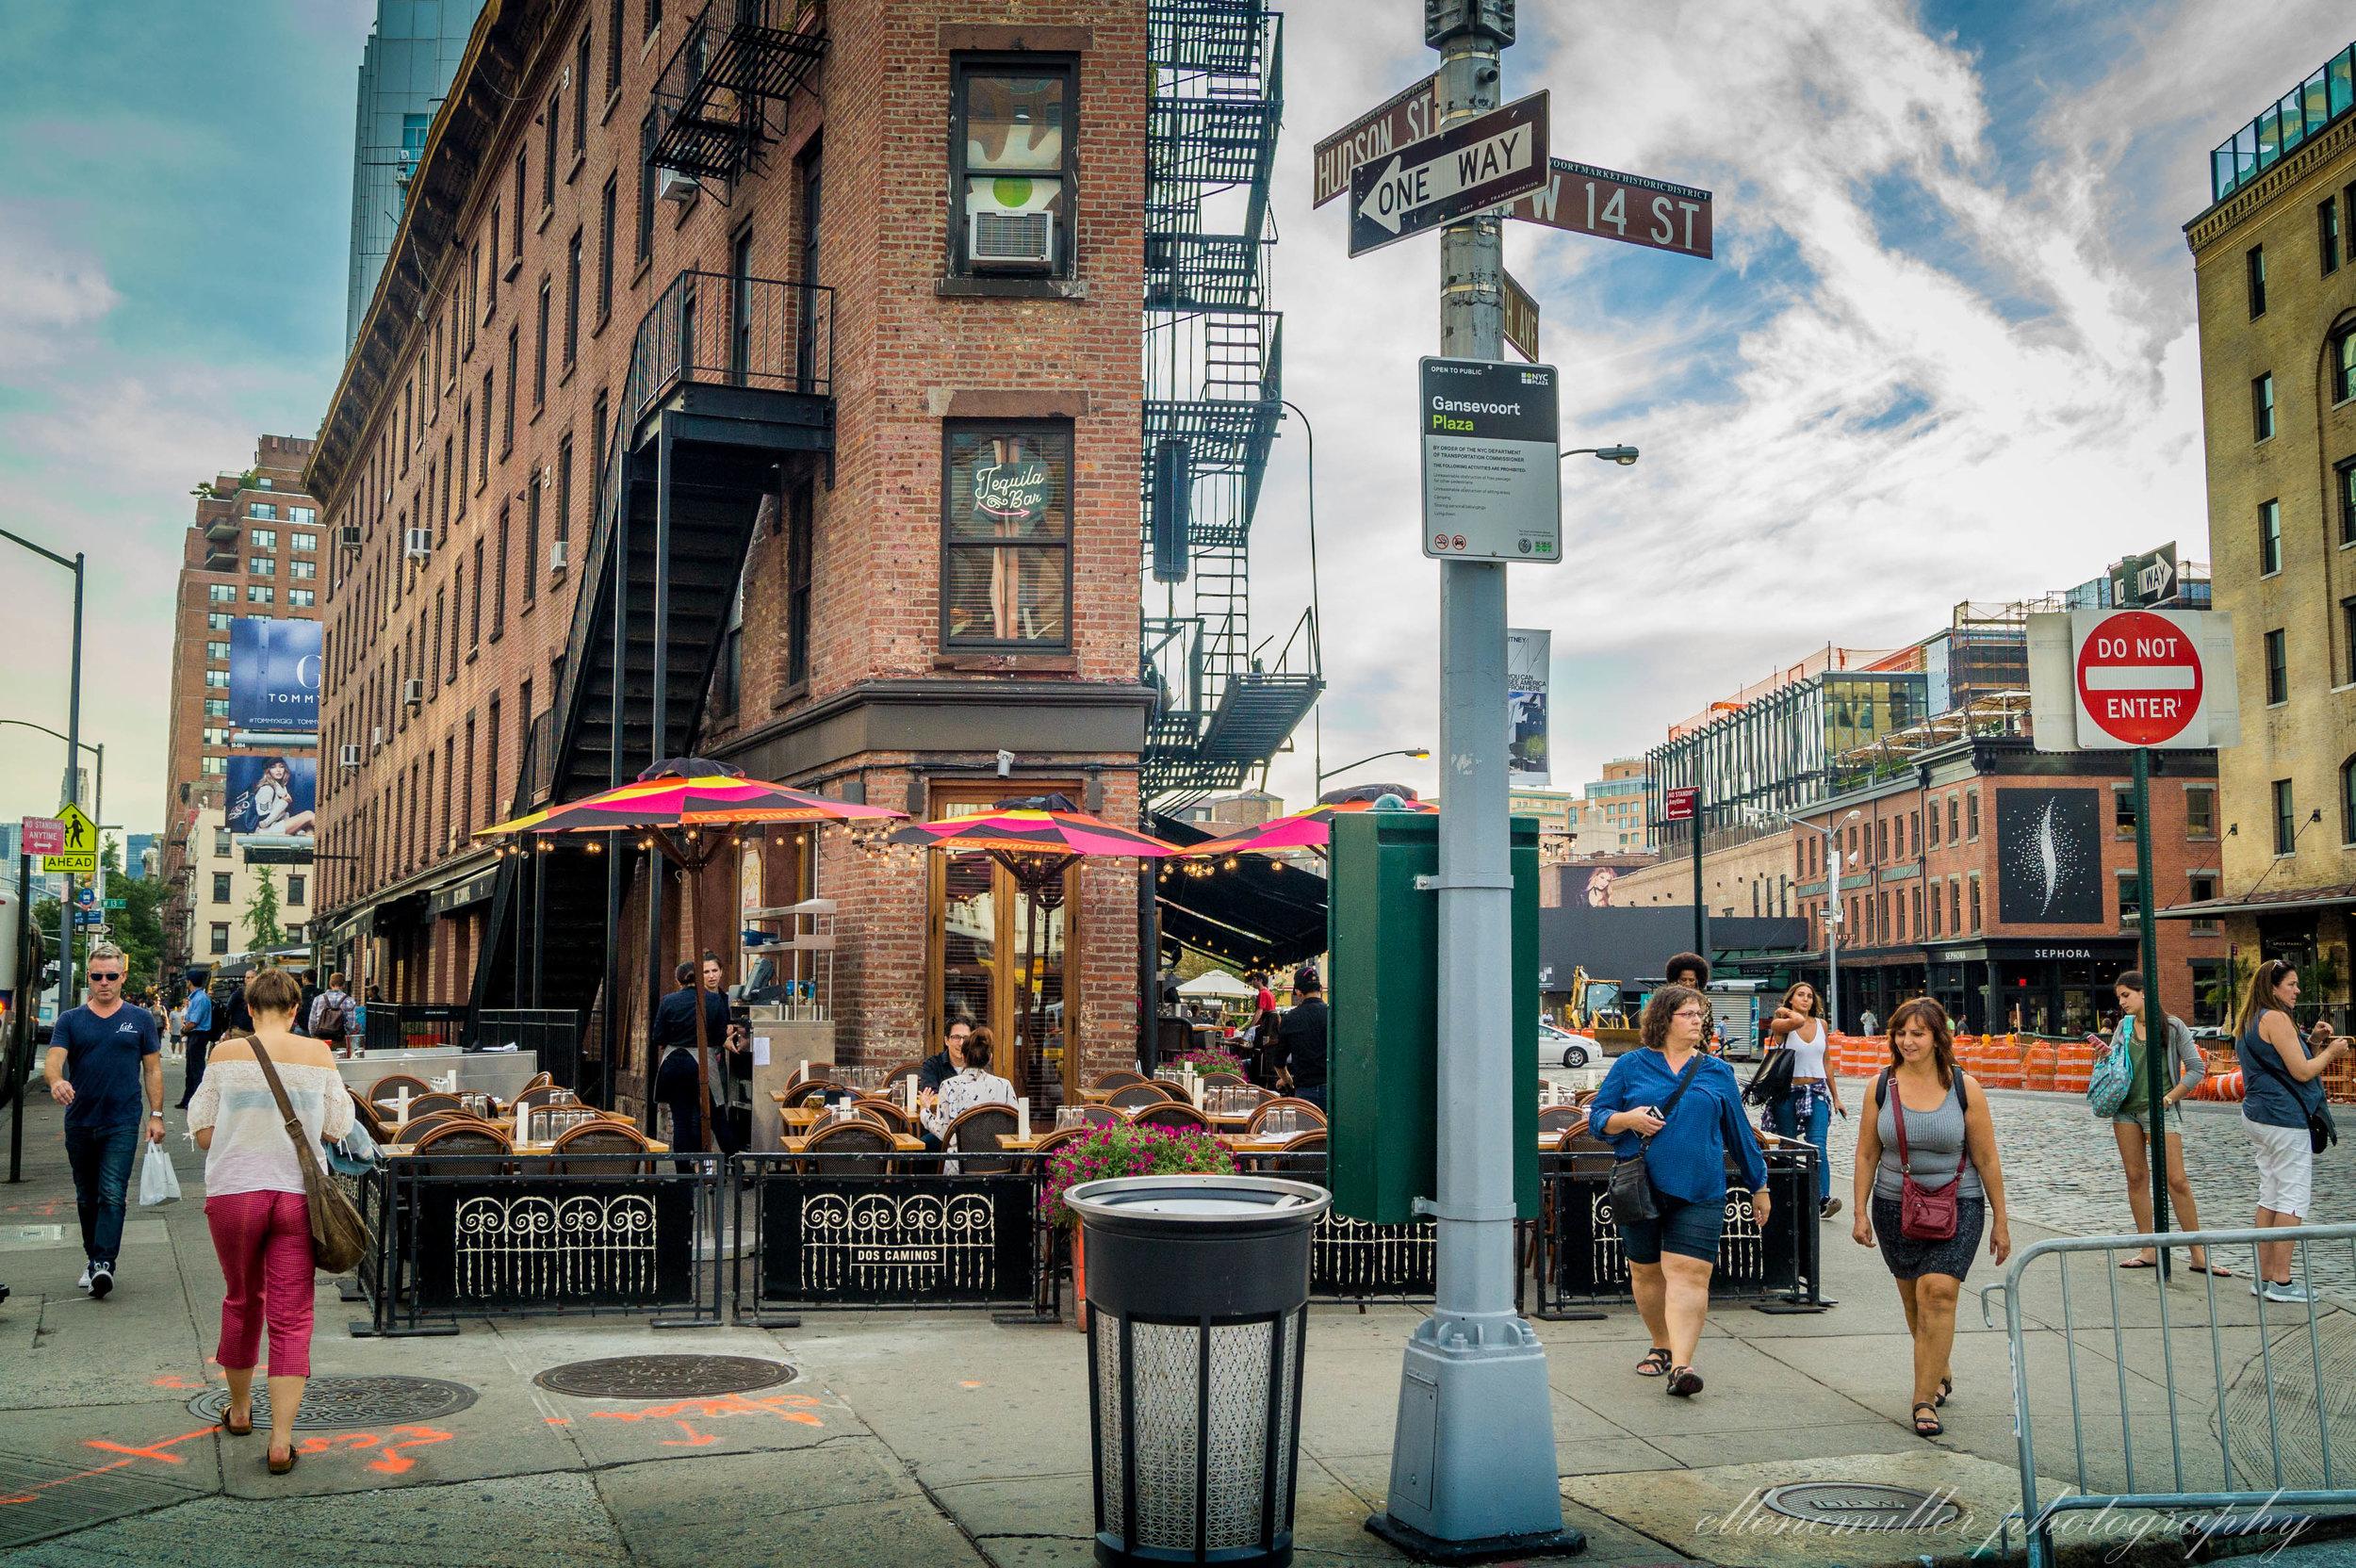 20160921-NYC-64.jpg